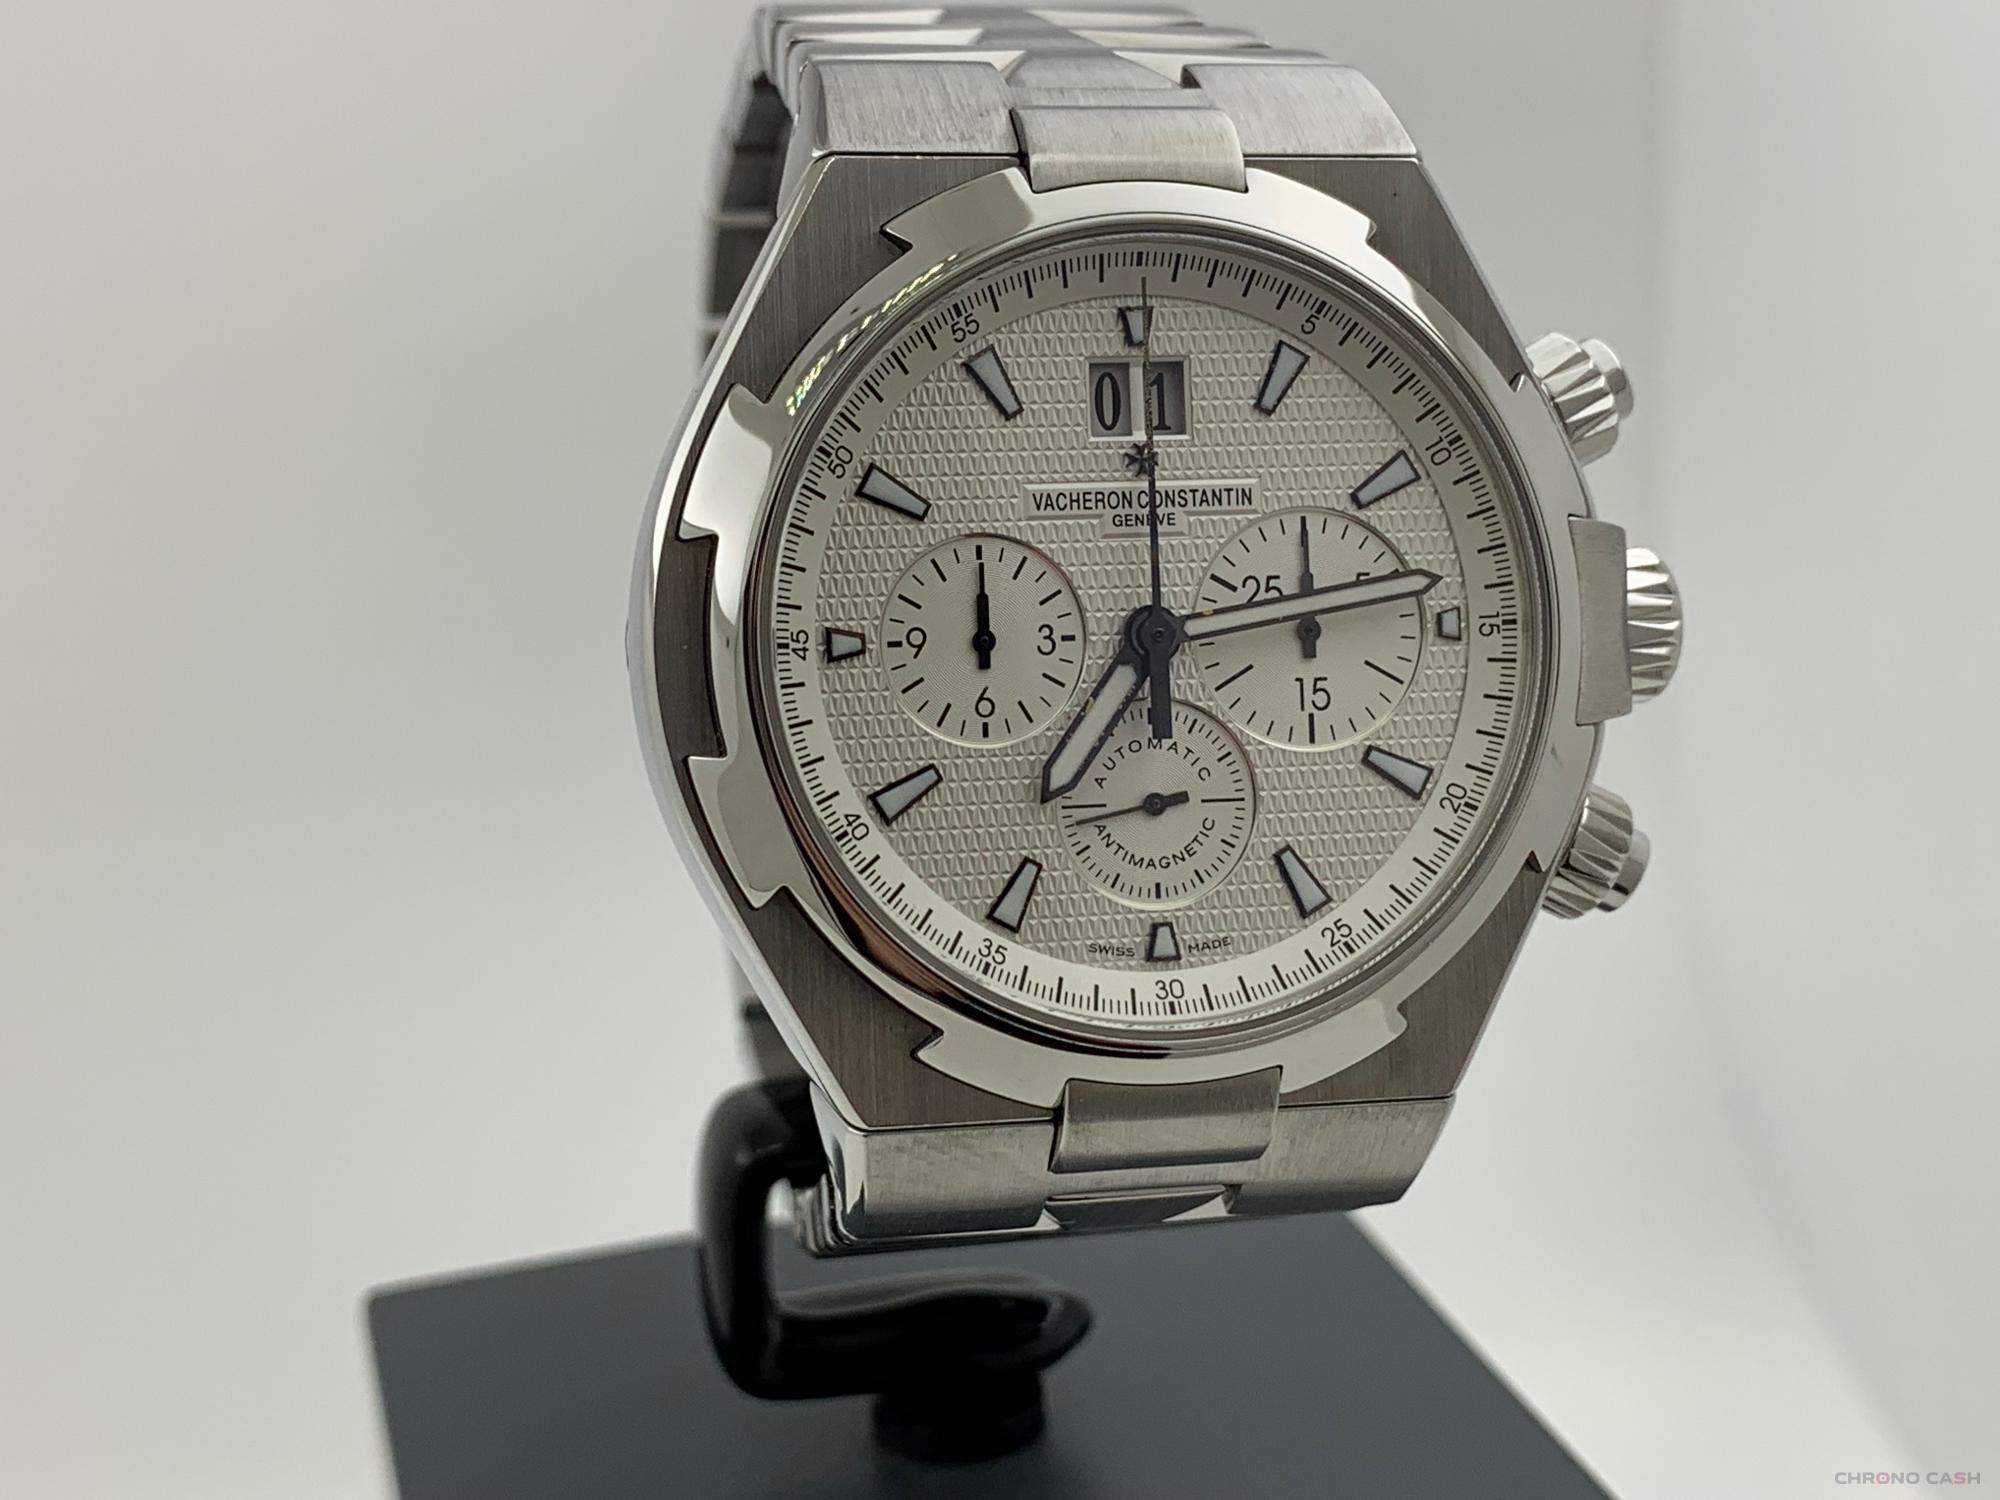 Vacheron Constantin Overseas Chronograph 42MM Automatic White Dial Like New 49150 2005